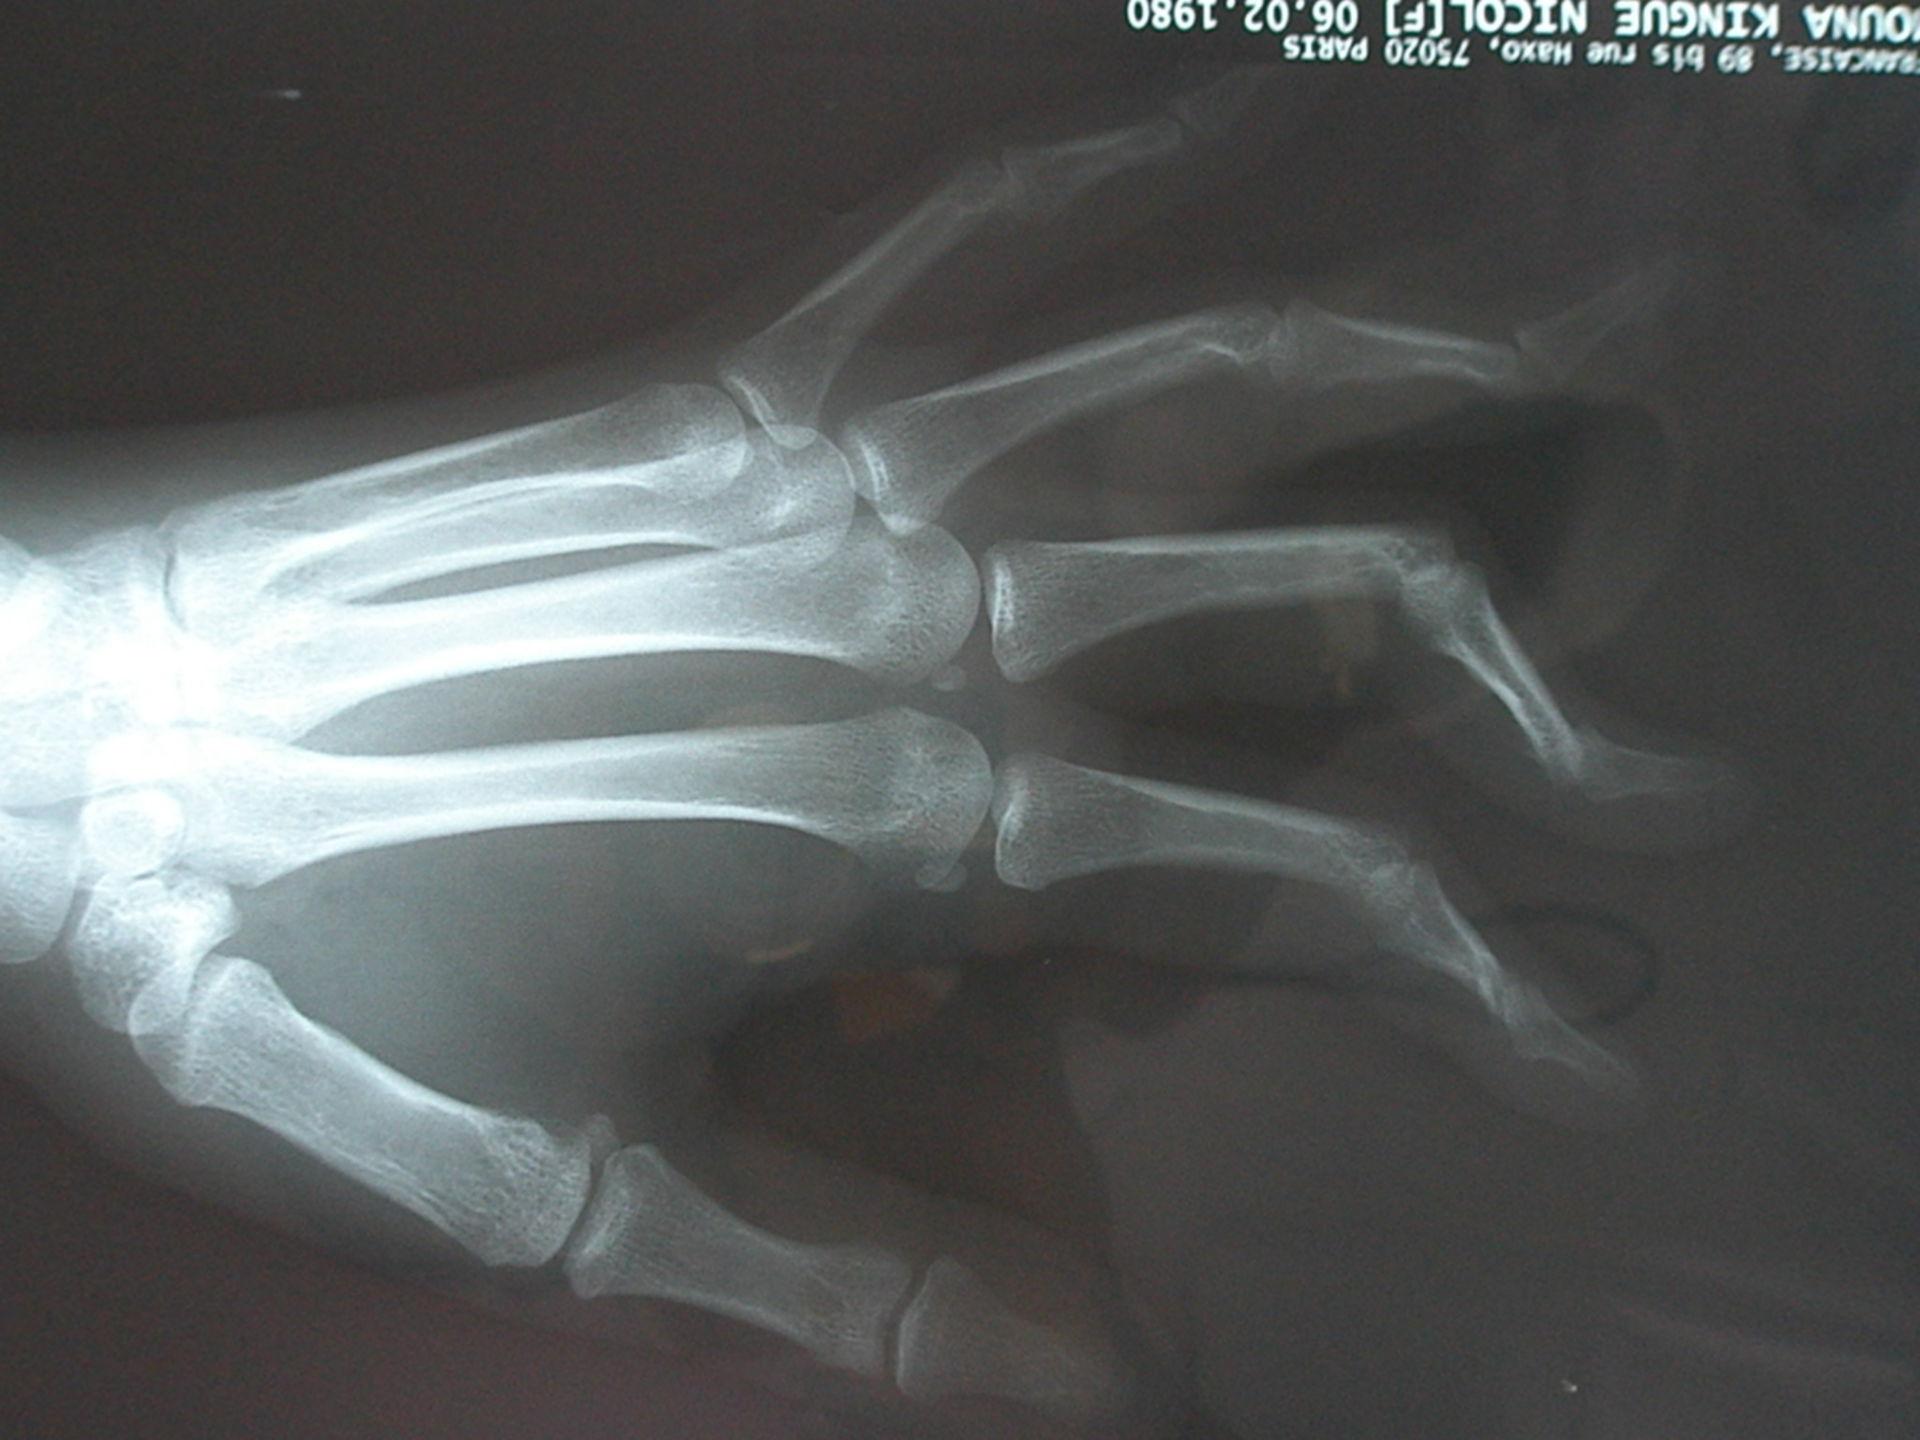 Jaccoud-Arthropathie, Röntgenaufnahme